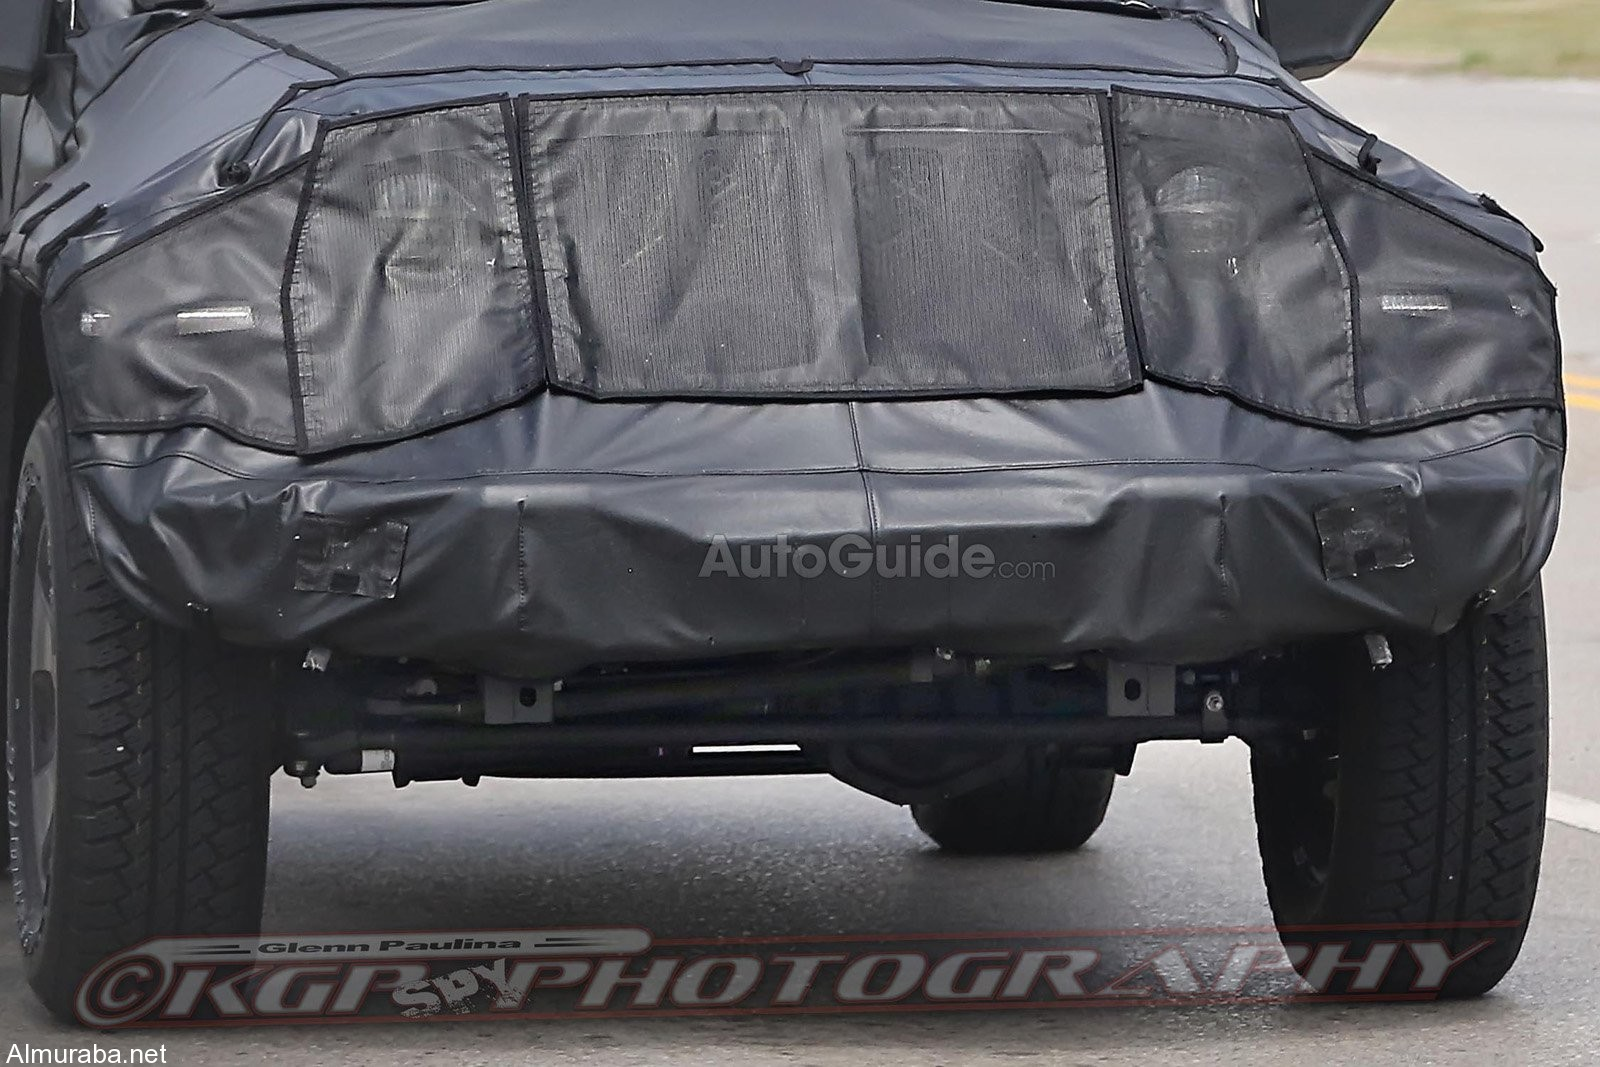 2018-Jeep-Wrangler-Spy-Shots-18